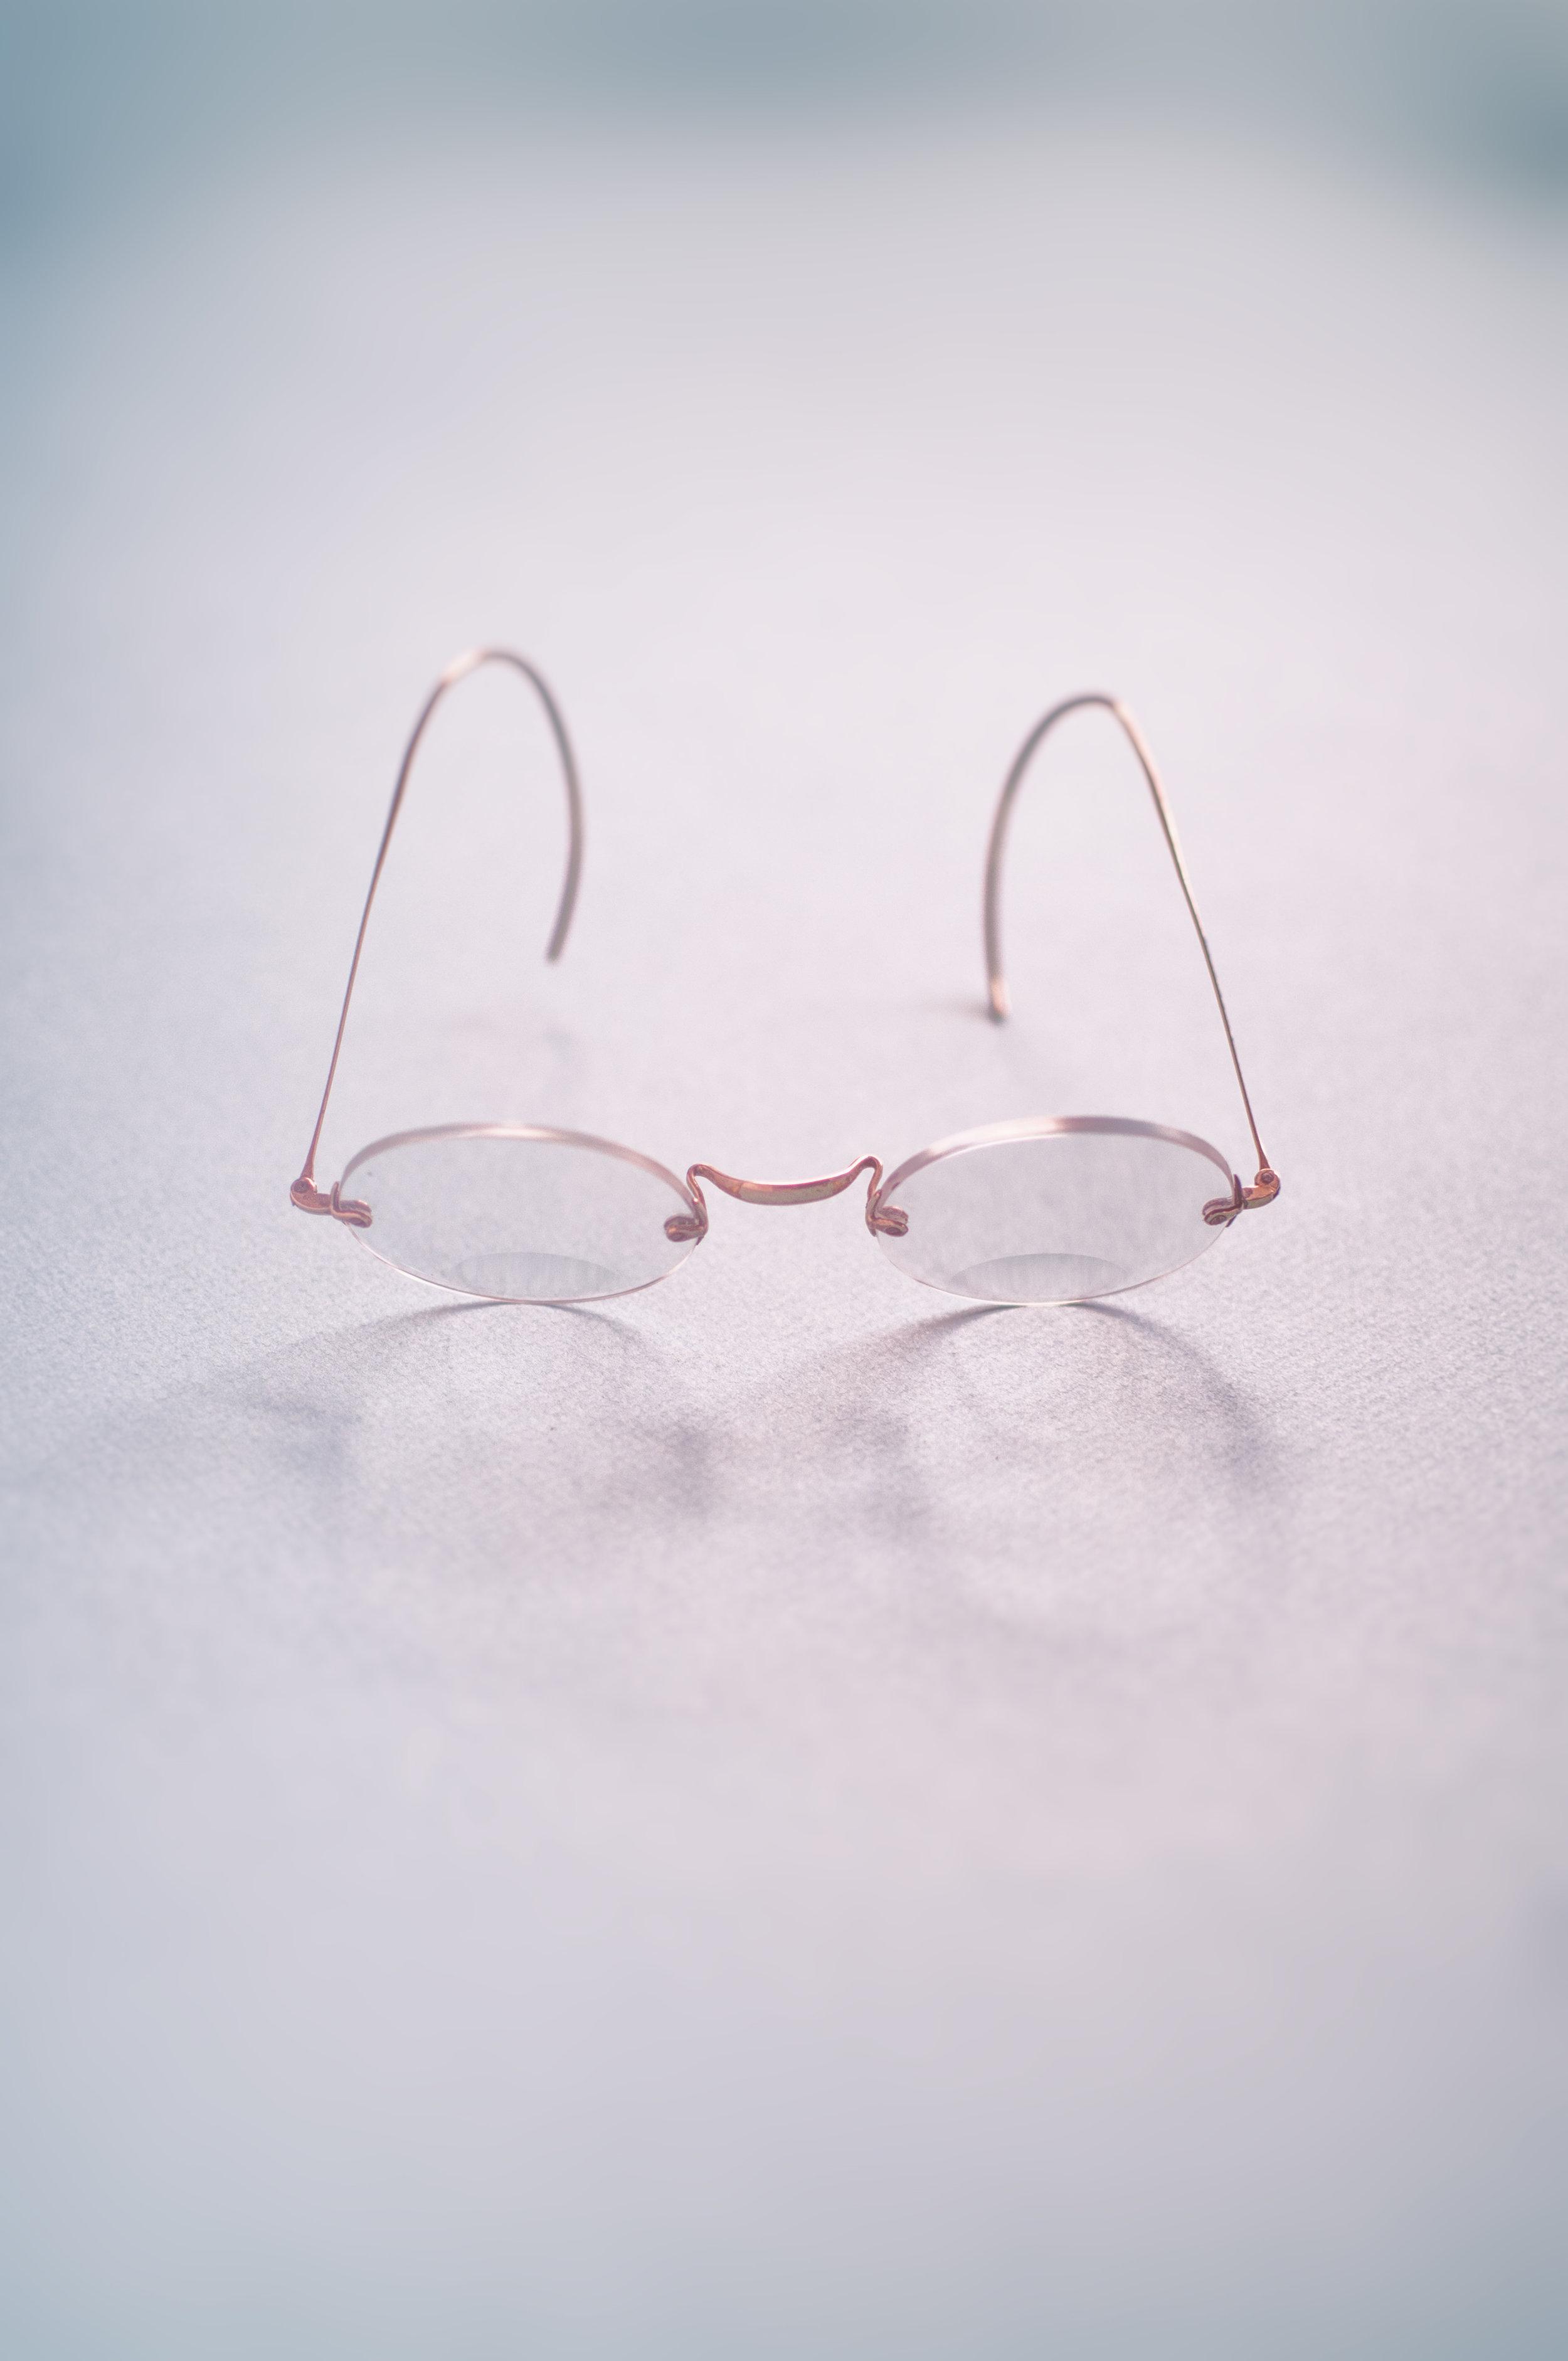 Objects_Glasses001.jpg